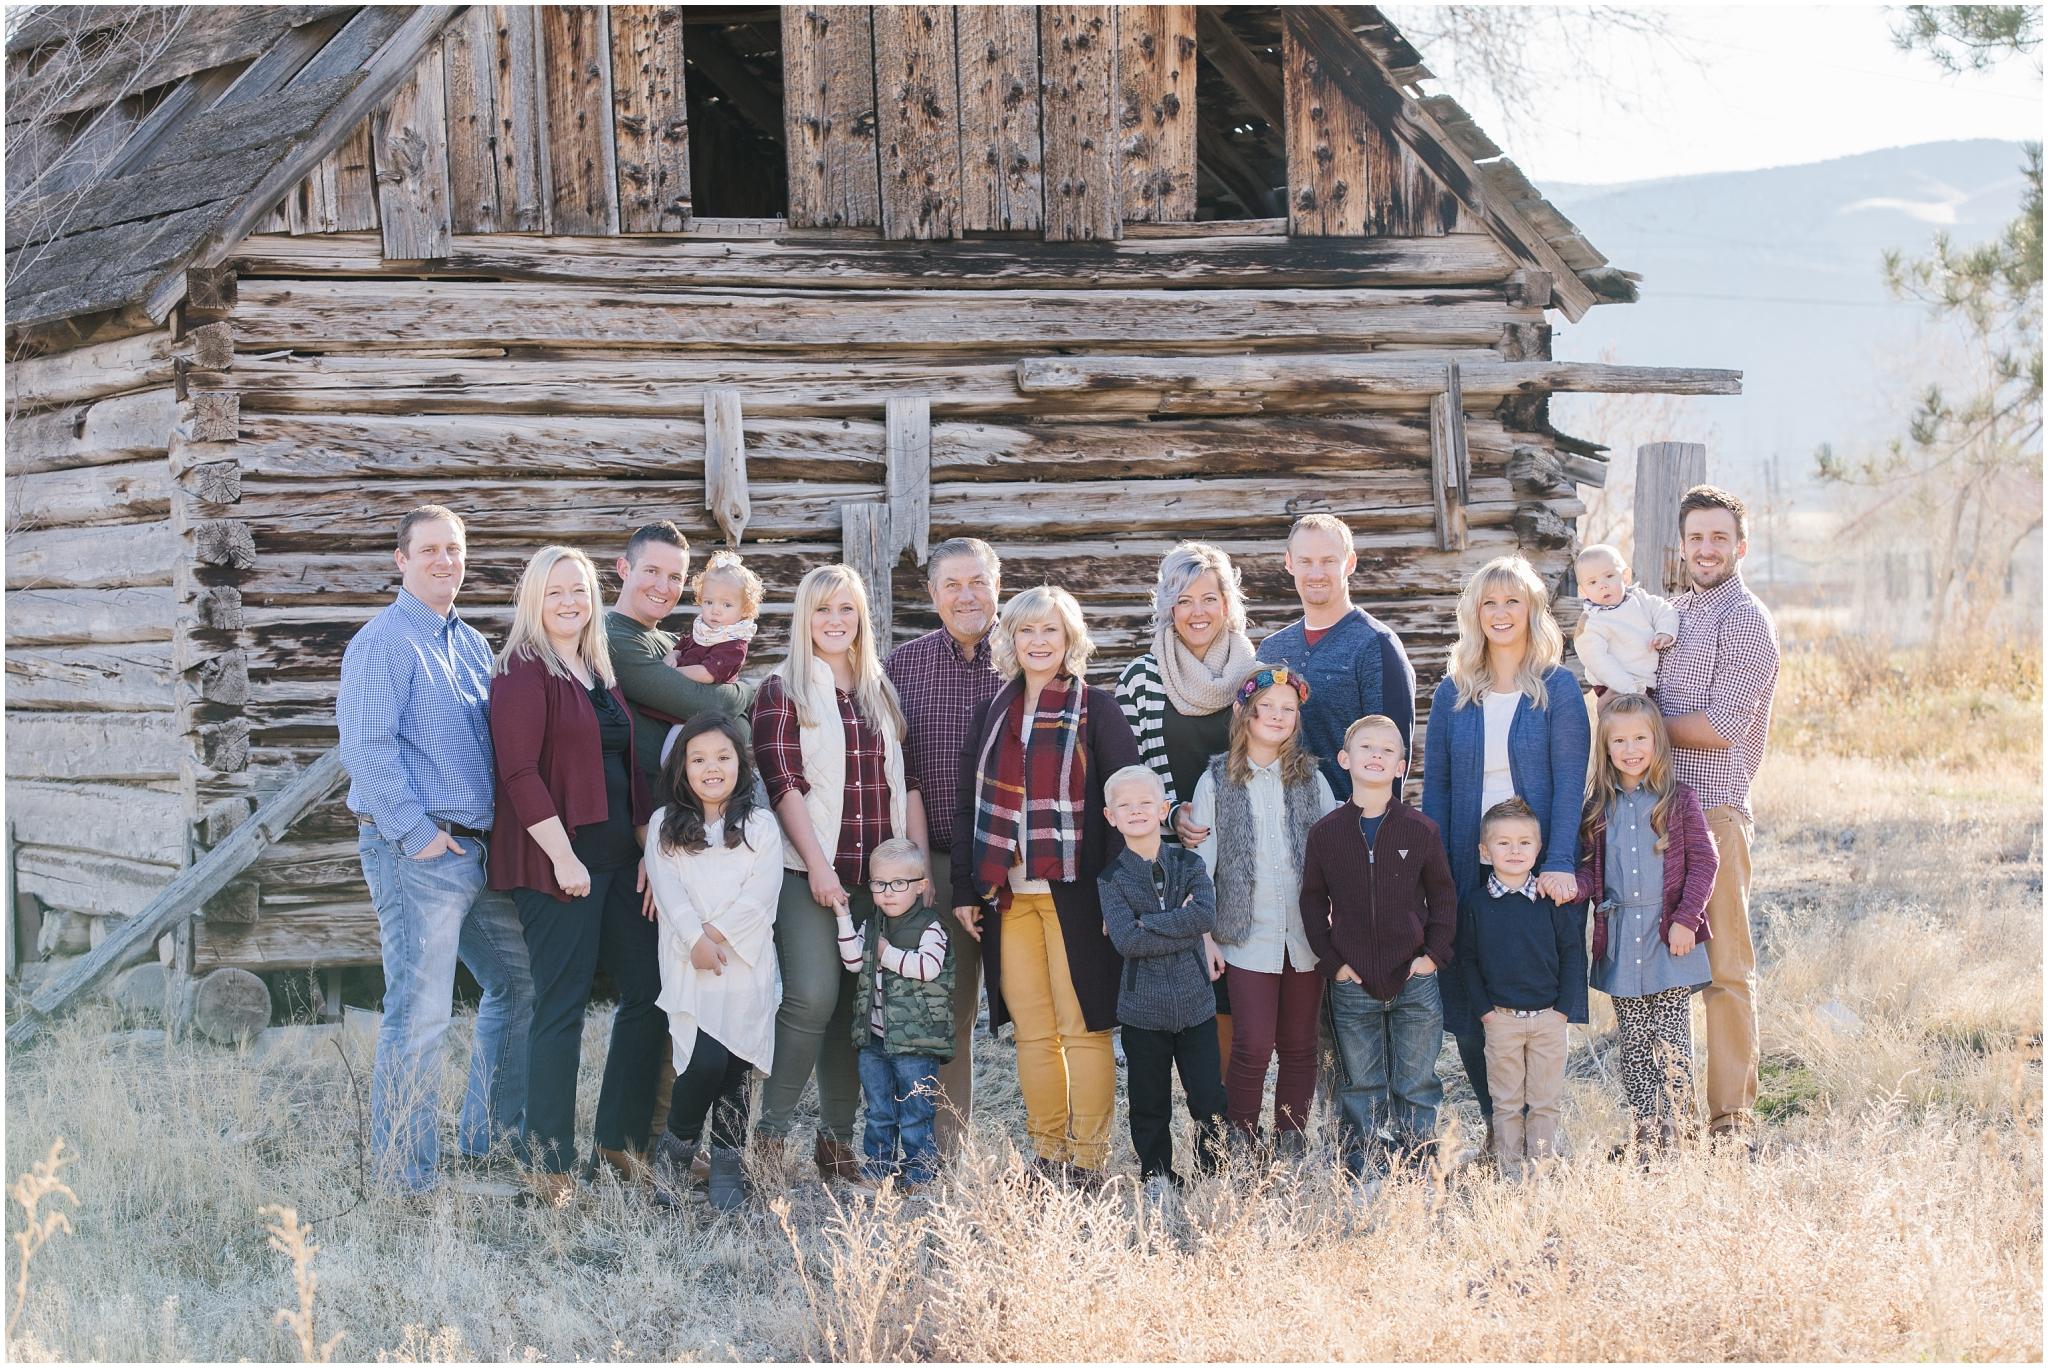 Laws-12_Lizzie-B-Imagery-Utah-Family-Photographer-Salt-Lake-City-Park-City-Davis-County-Clearfield.jpg